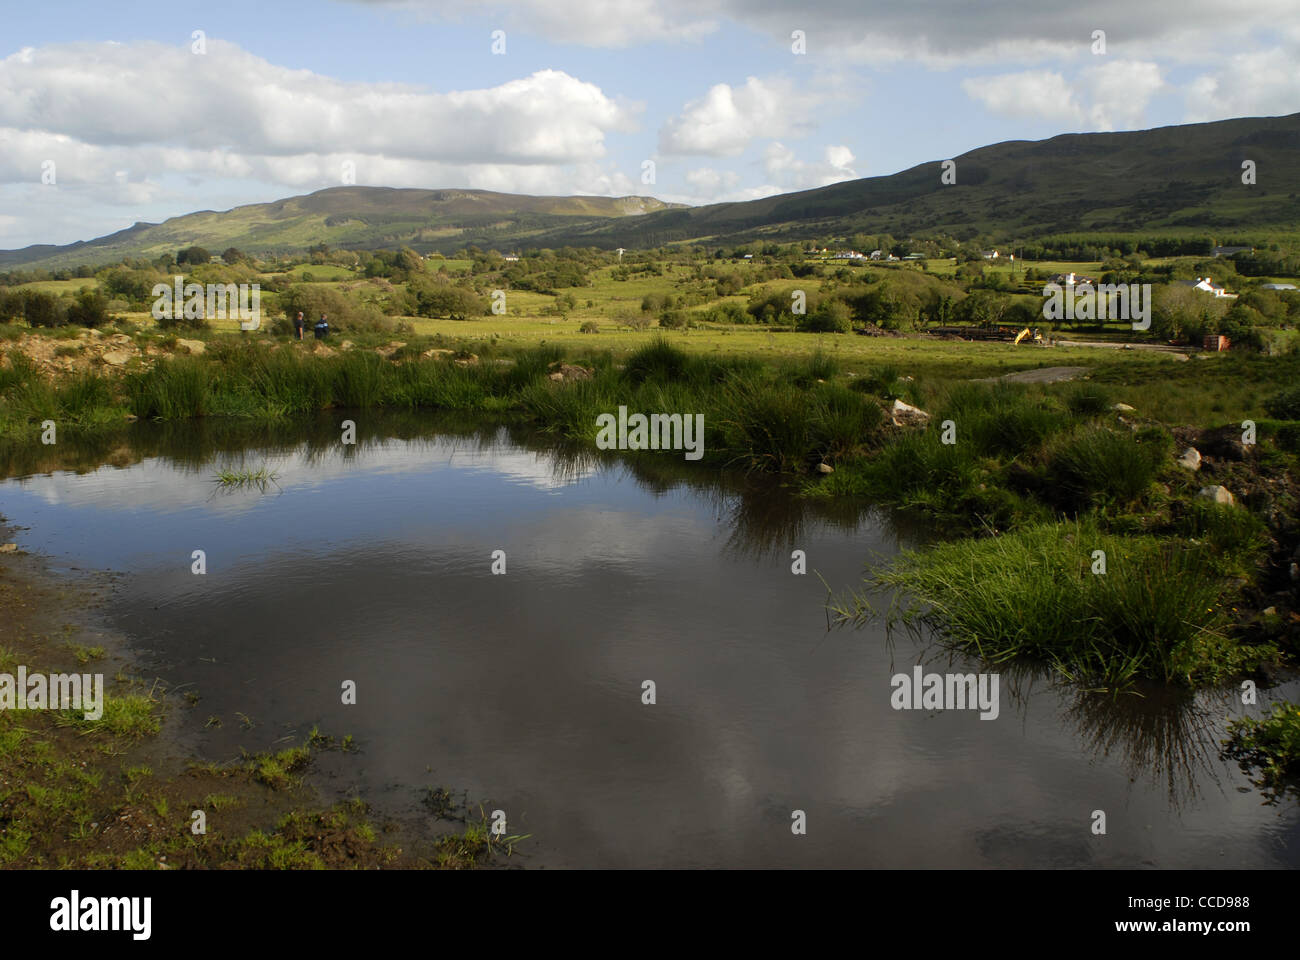 Surroundings of Lough Melvin, County Leitrim, Connacht, Ireland, Europe. - Stock Image